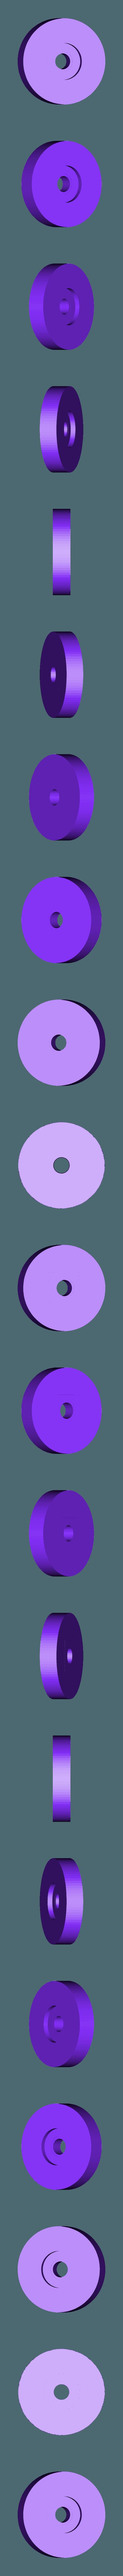 GADGETs_wheel v2 uses servo round horn.stl Download free STL file GADGET the robotic Gremlin • 3D printing object, atarka3